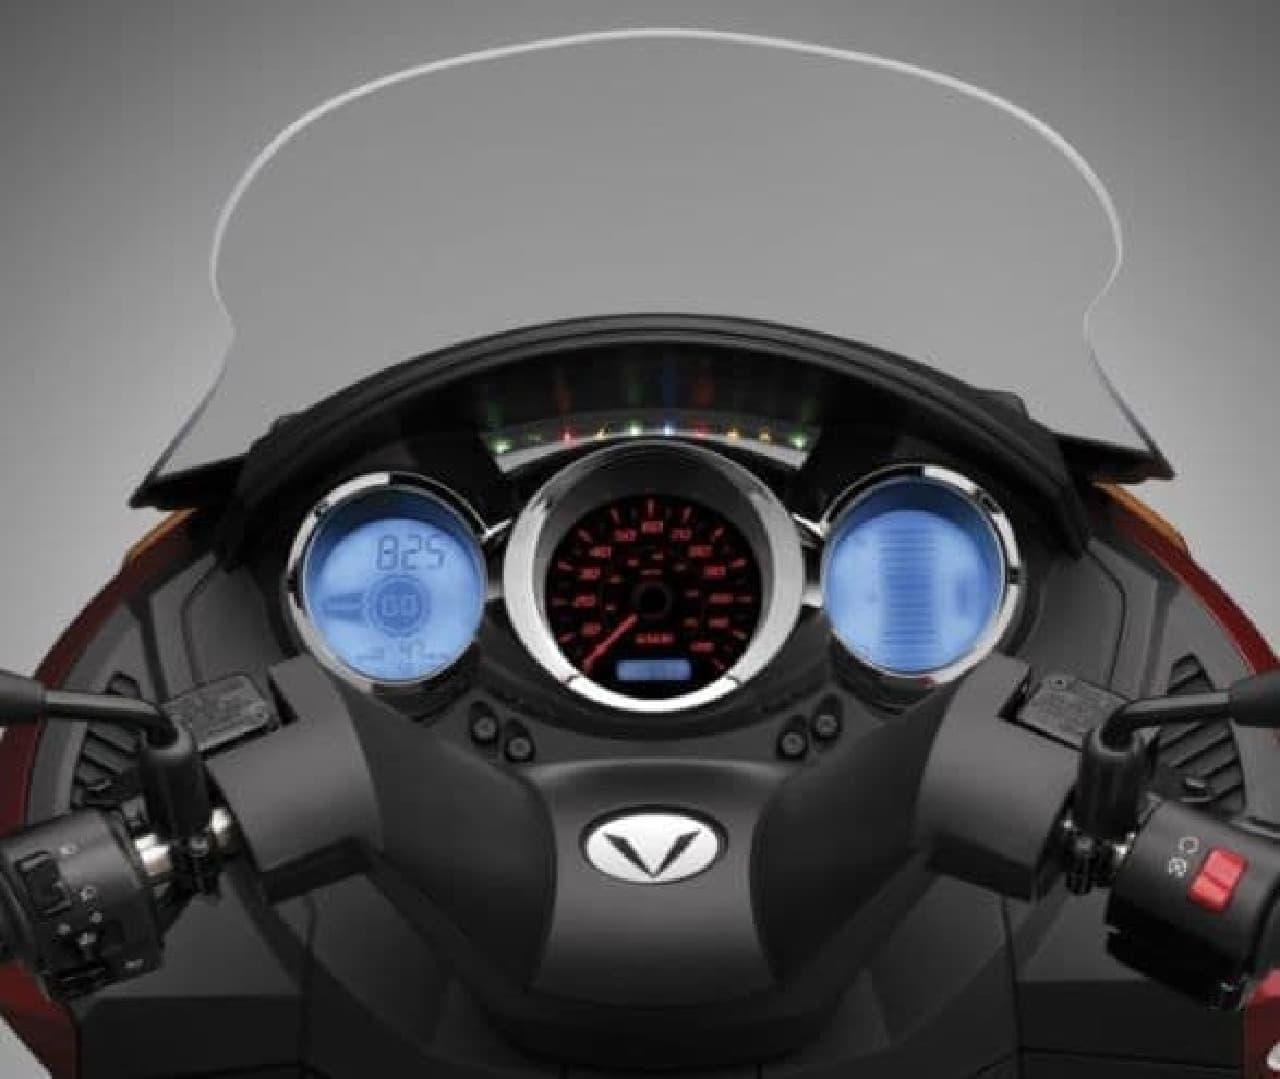 Vectrixの電動バイク「VX-1」